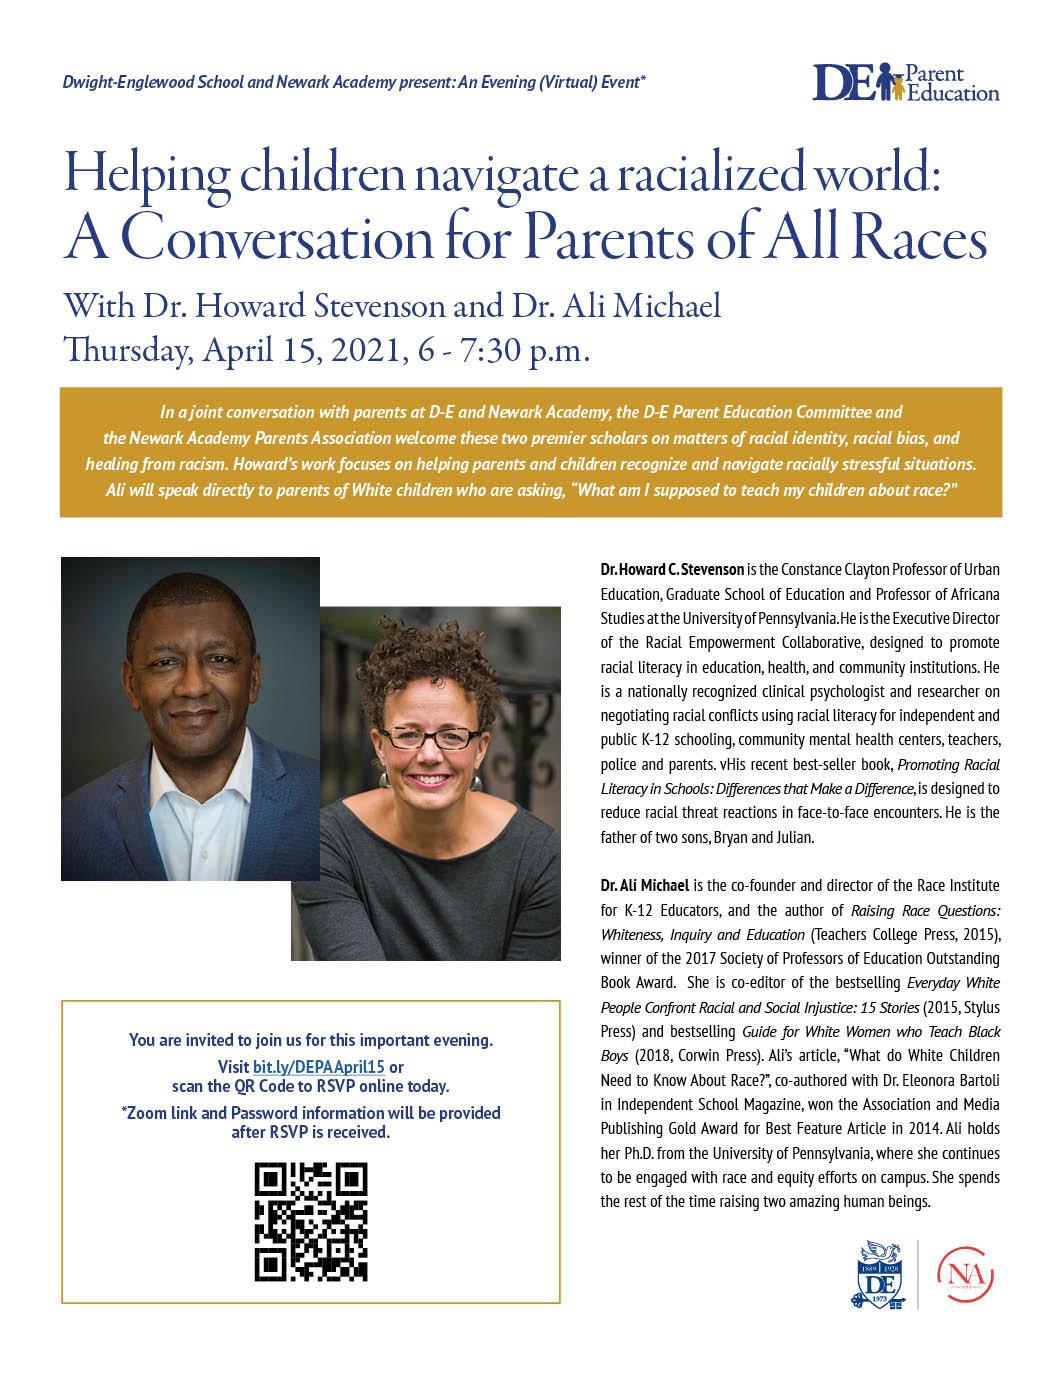 Parent Ed Talk: Helping children navigate a racialized world: A Conversation for Parents of All Races